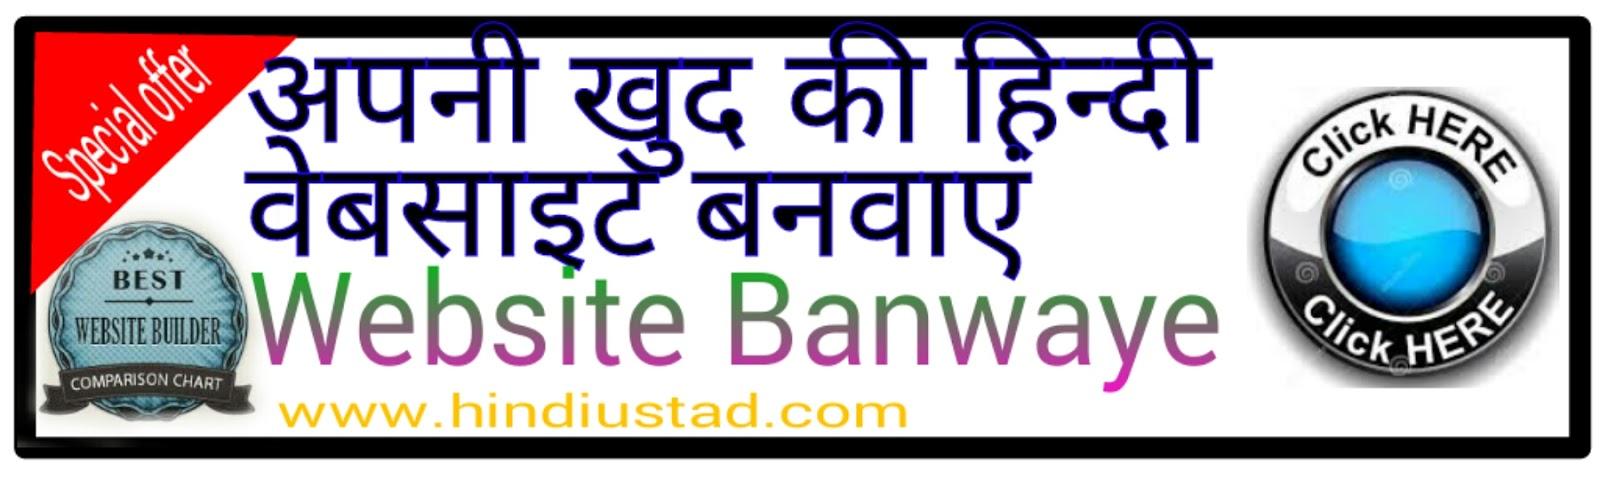 http://www.hindiustad.com/p/blog-website-banwaye.html